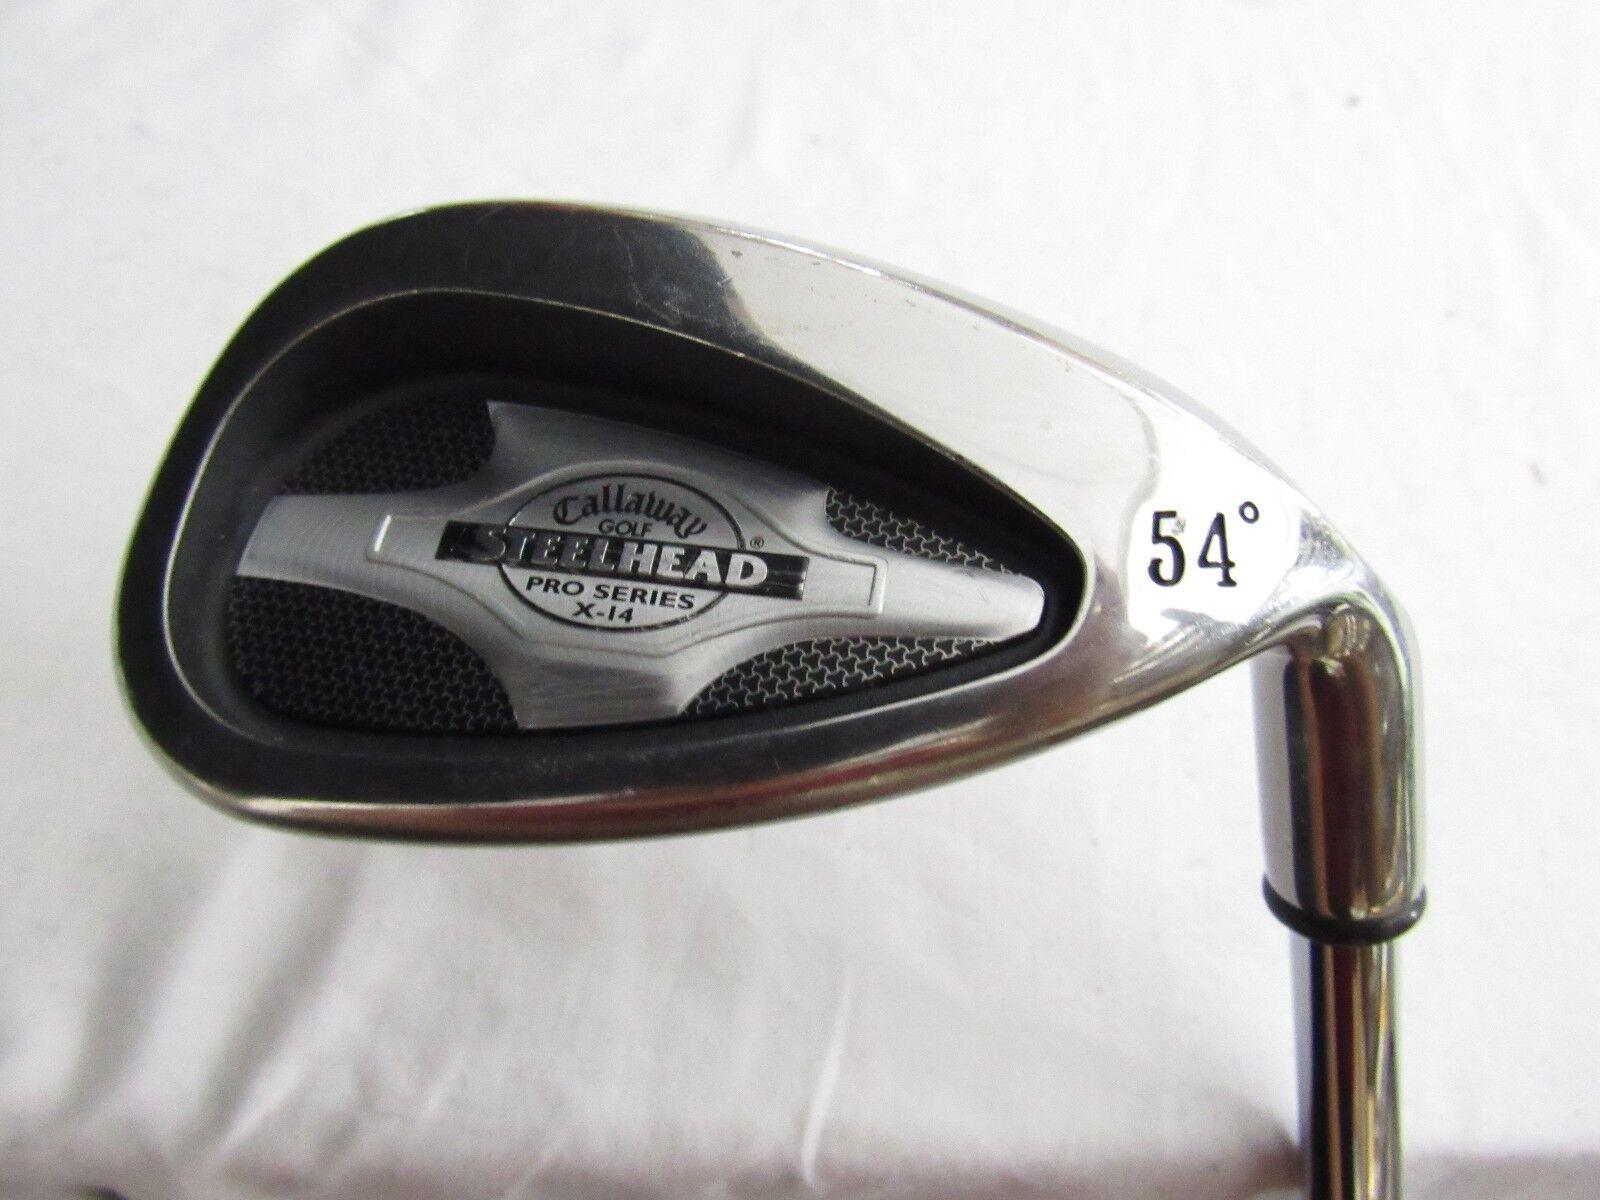 Used RH Callaway SteelHead X14 Pro Series 54° Sand  S  Wedge Steel Stiff S Flex  en stock